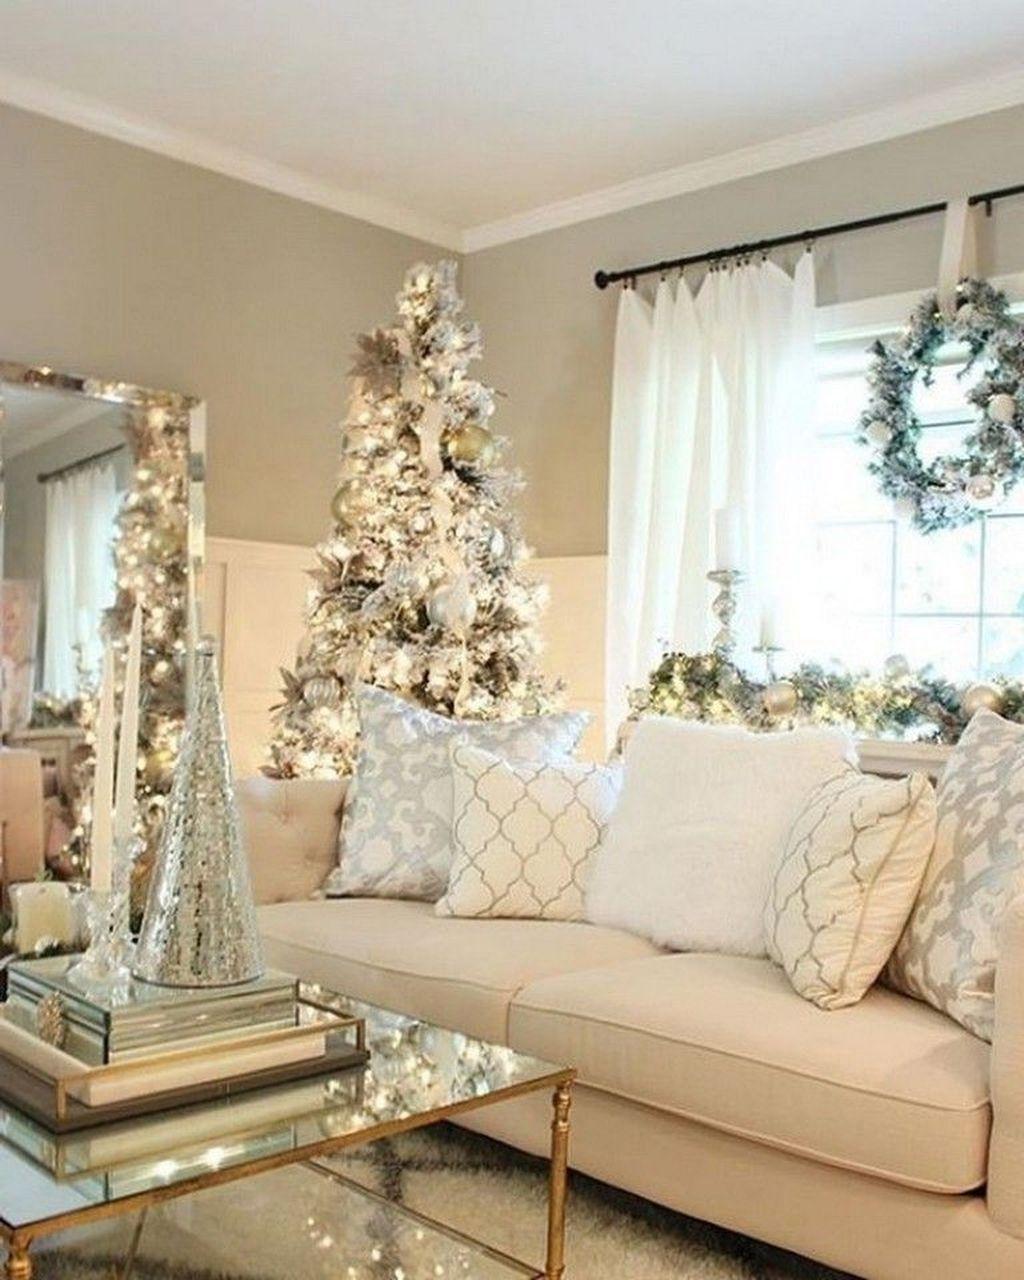 30+ Inspiring Christmas Decoration Ideas For Your Living Room #christmasdecorideasforlivingroom